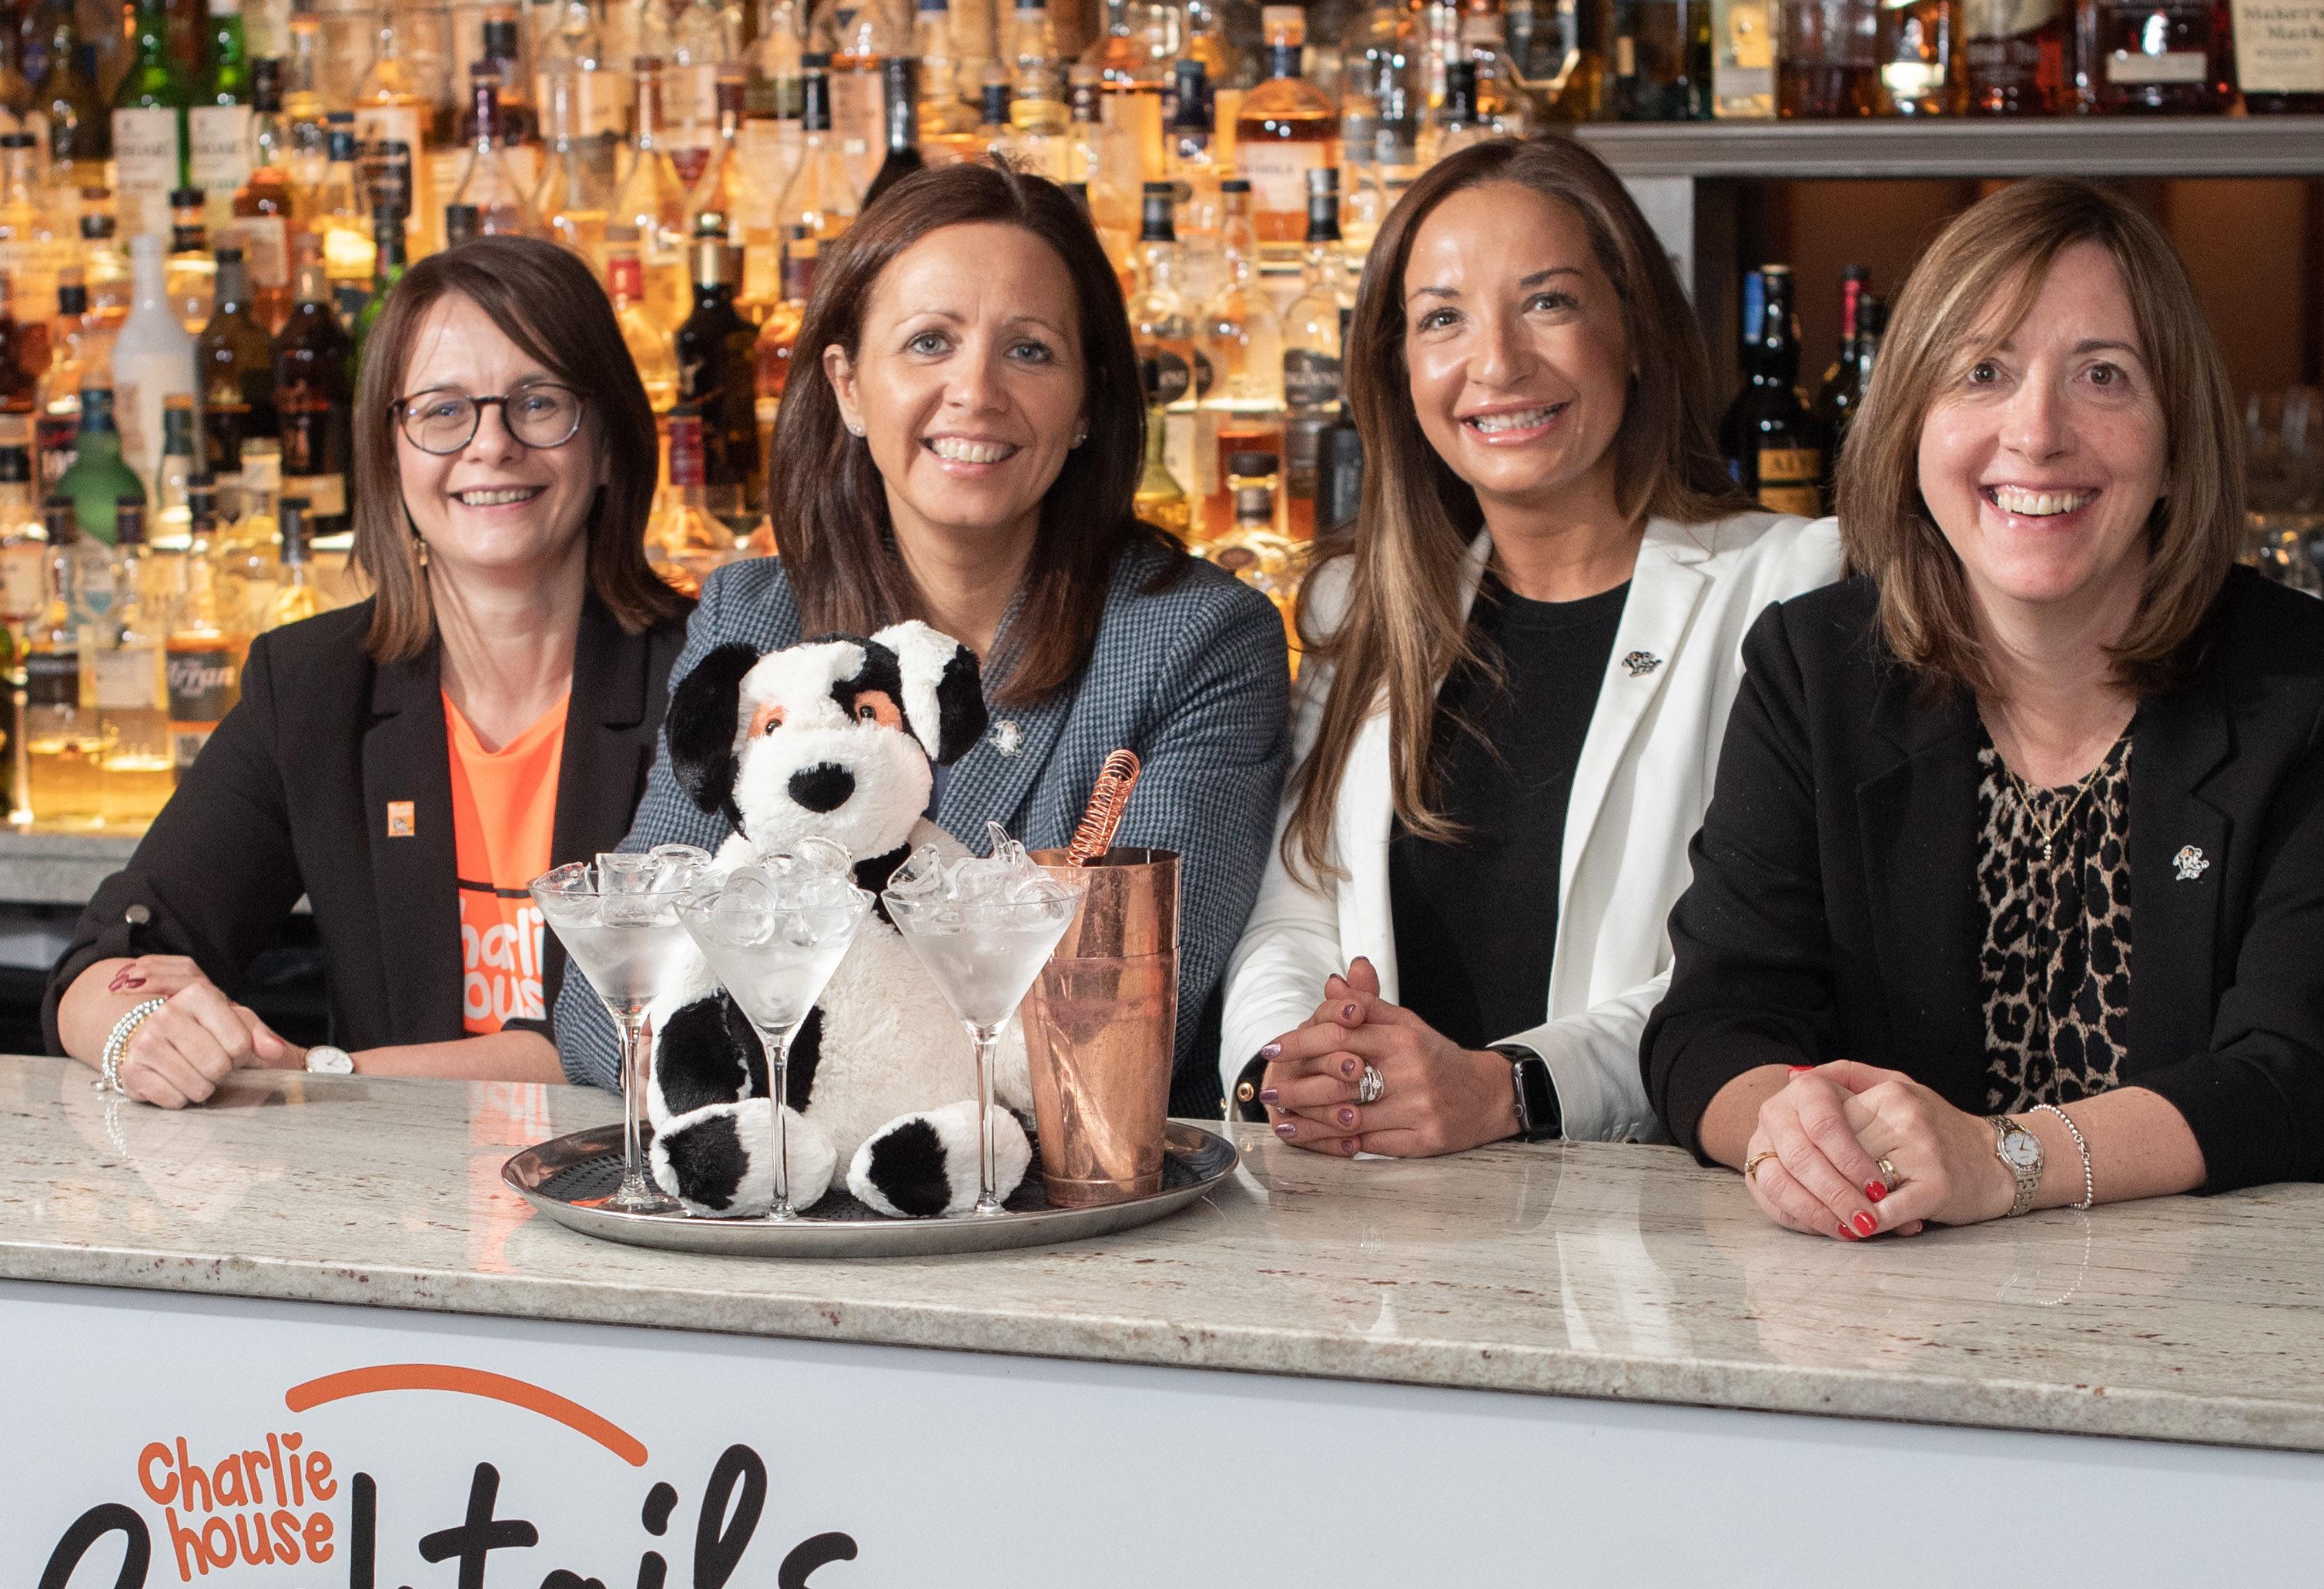 Charlie House Cocktails & Dreams Launch